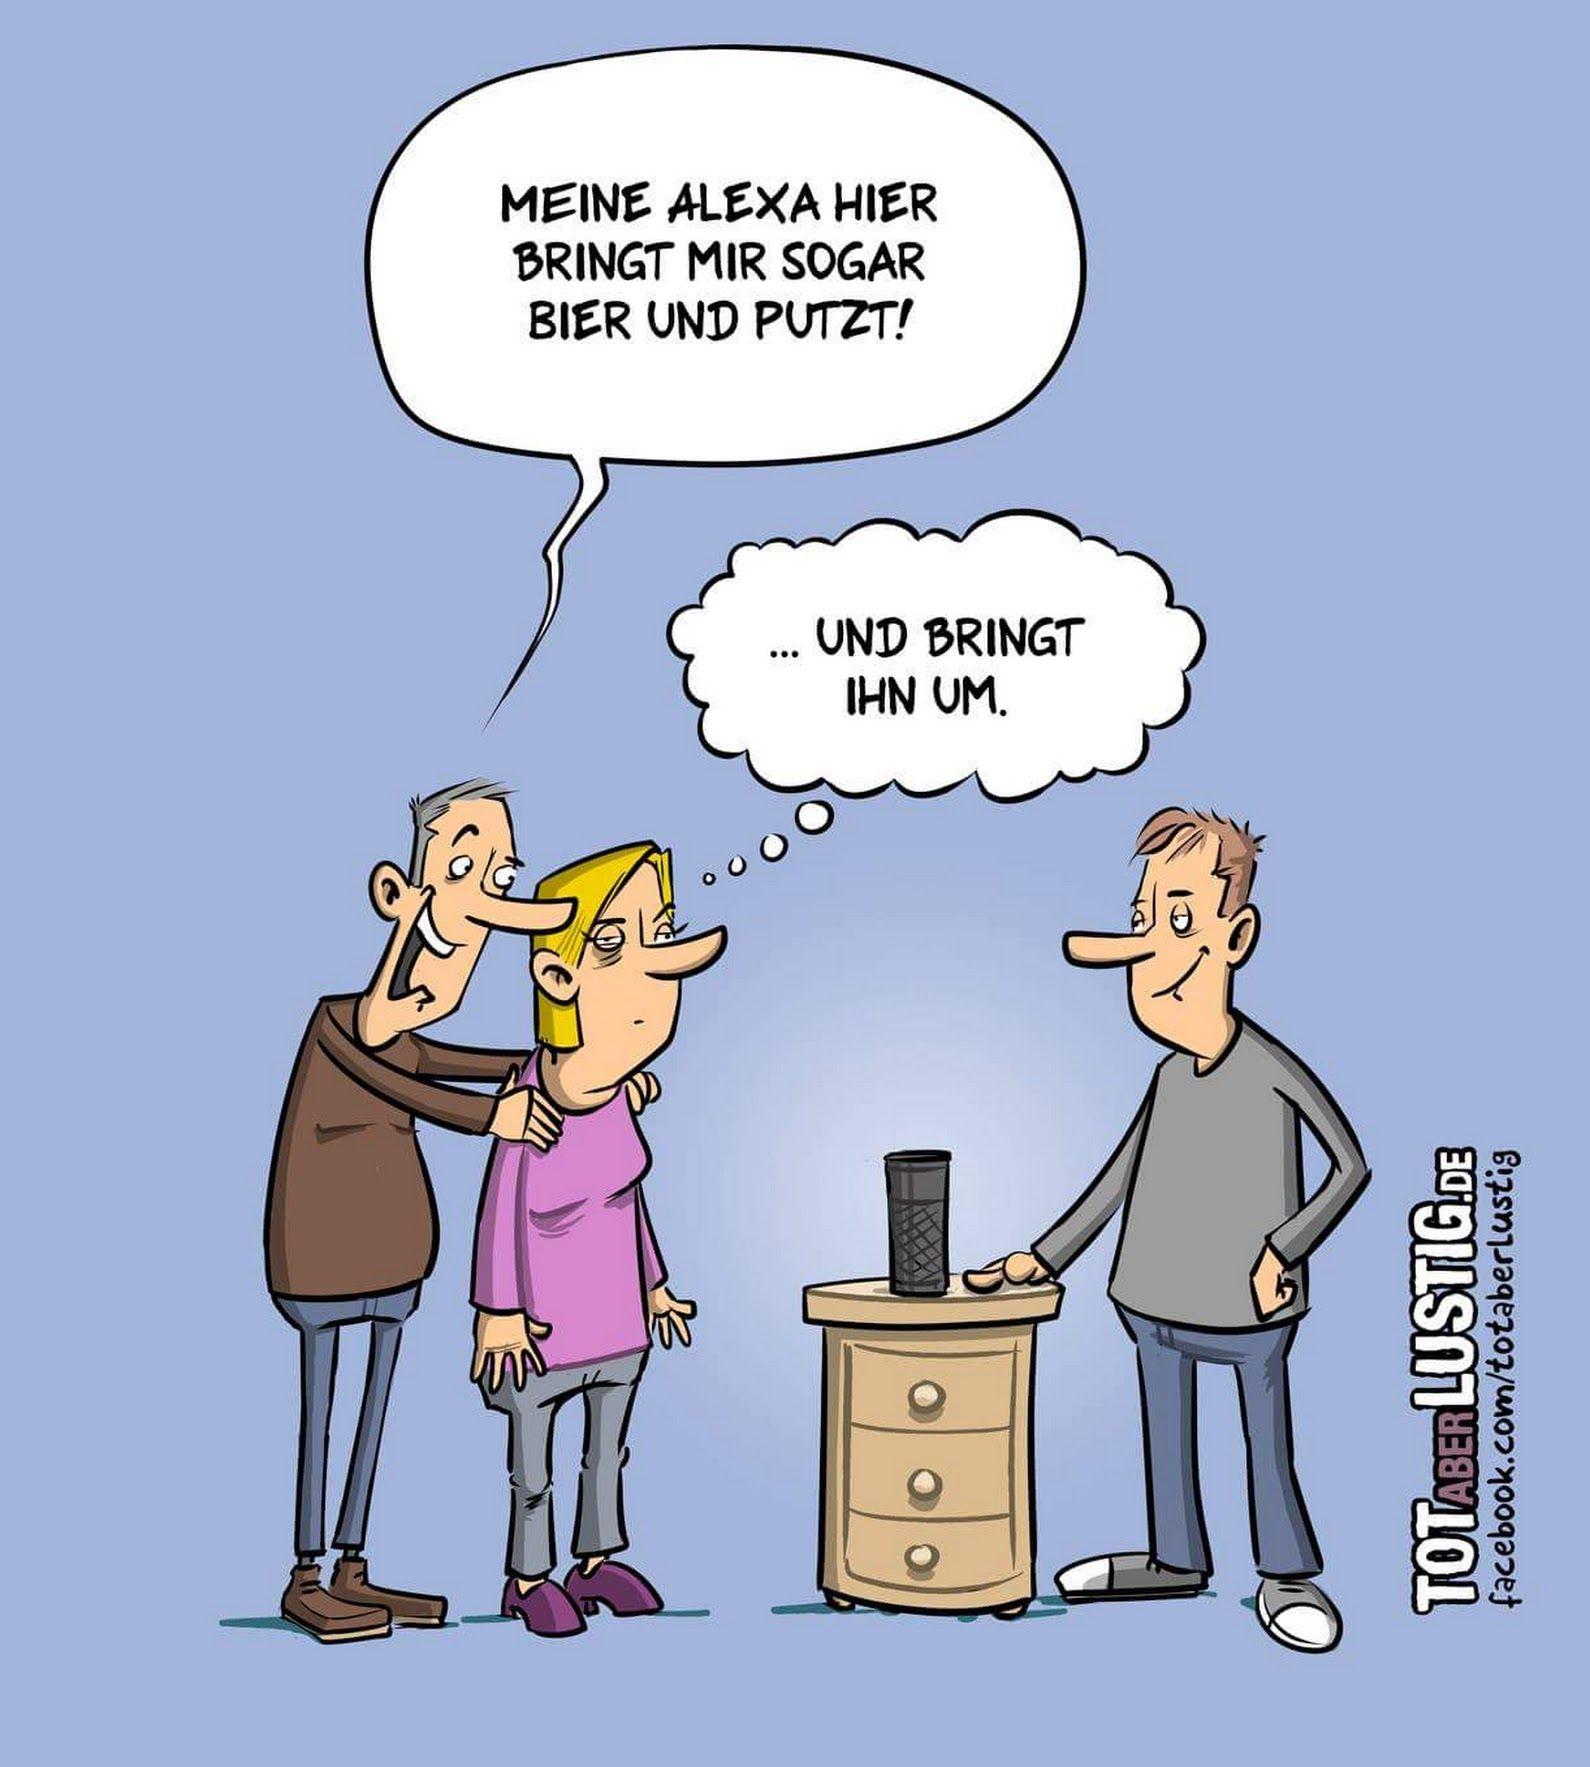 Sign in | Lustig, Witzig, Lachen